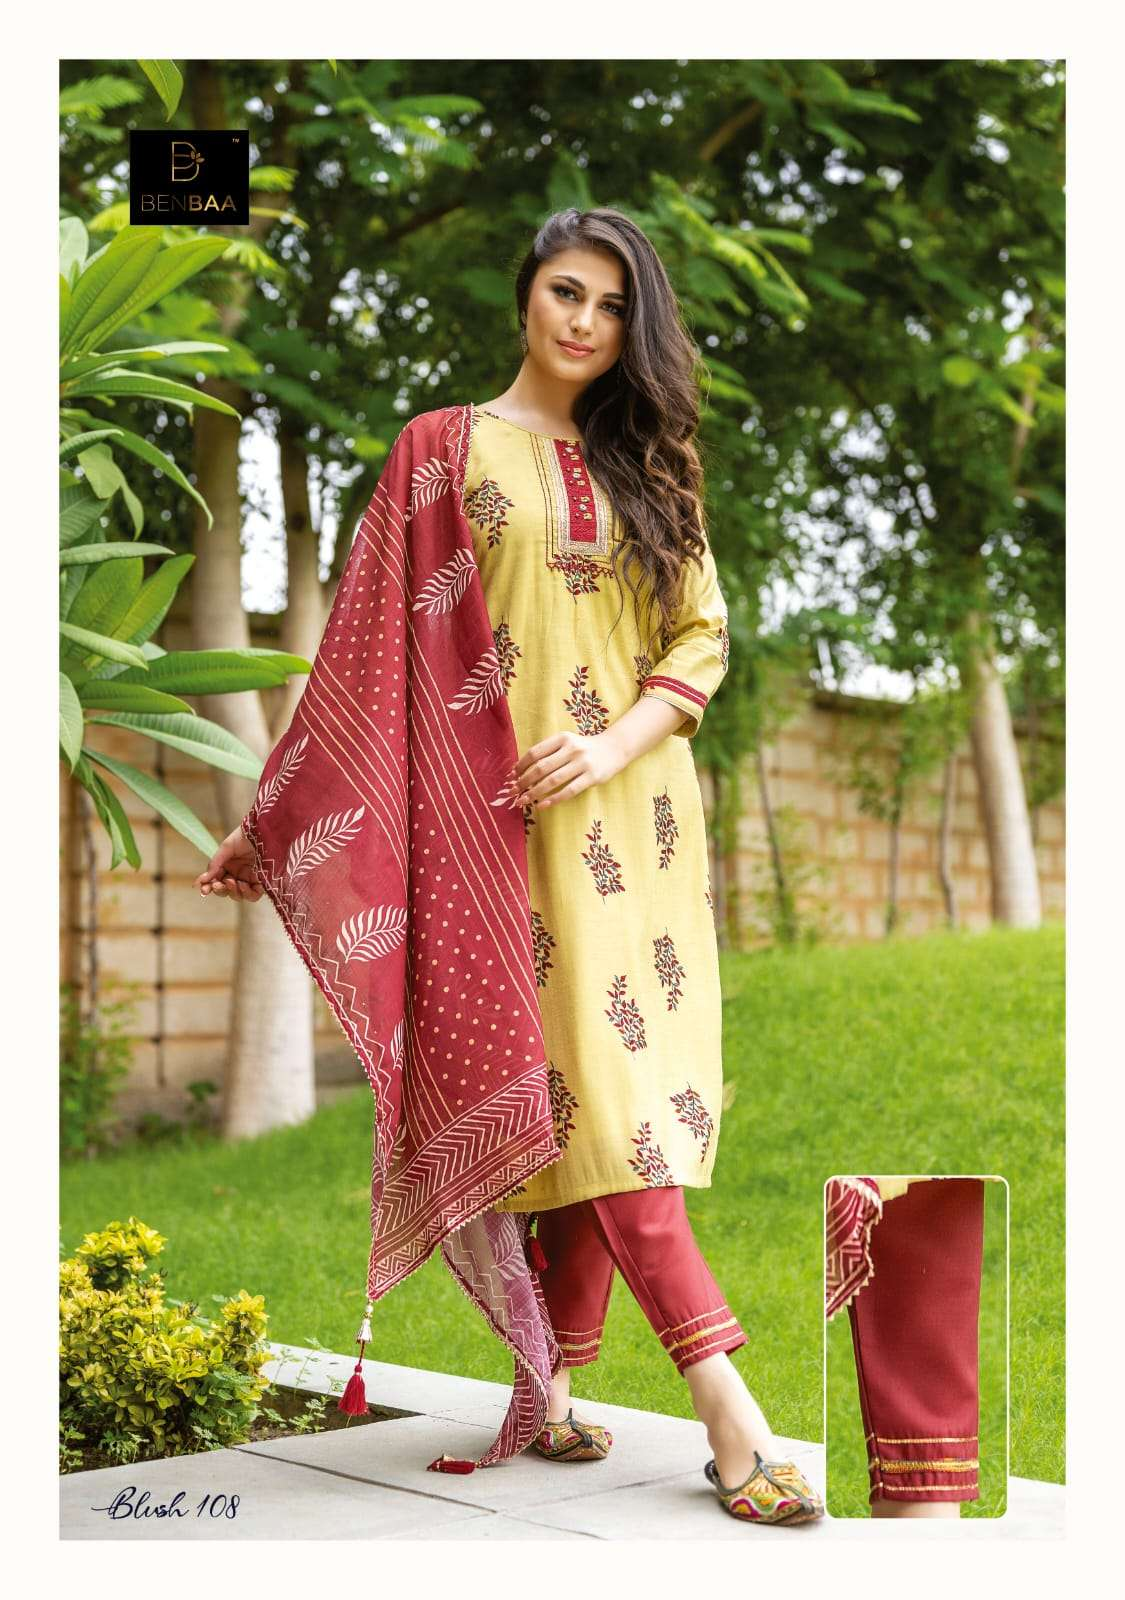 Benbaa Blush Fancy Cotton Kurti Bottom Dupatta Sets New Designs